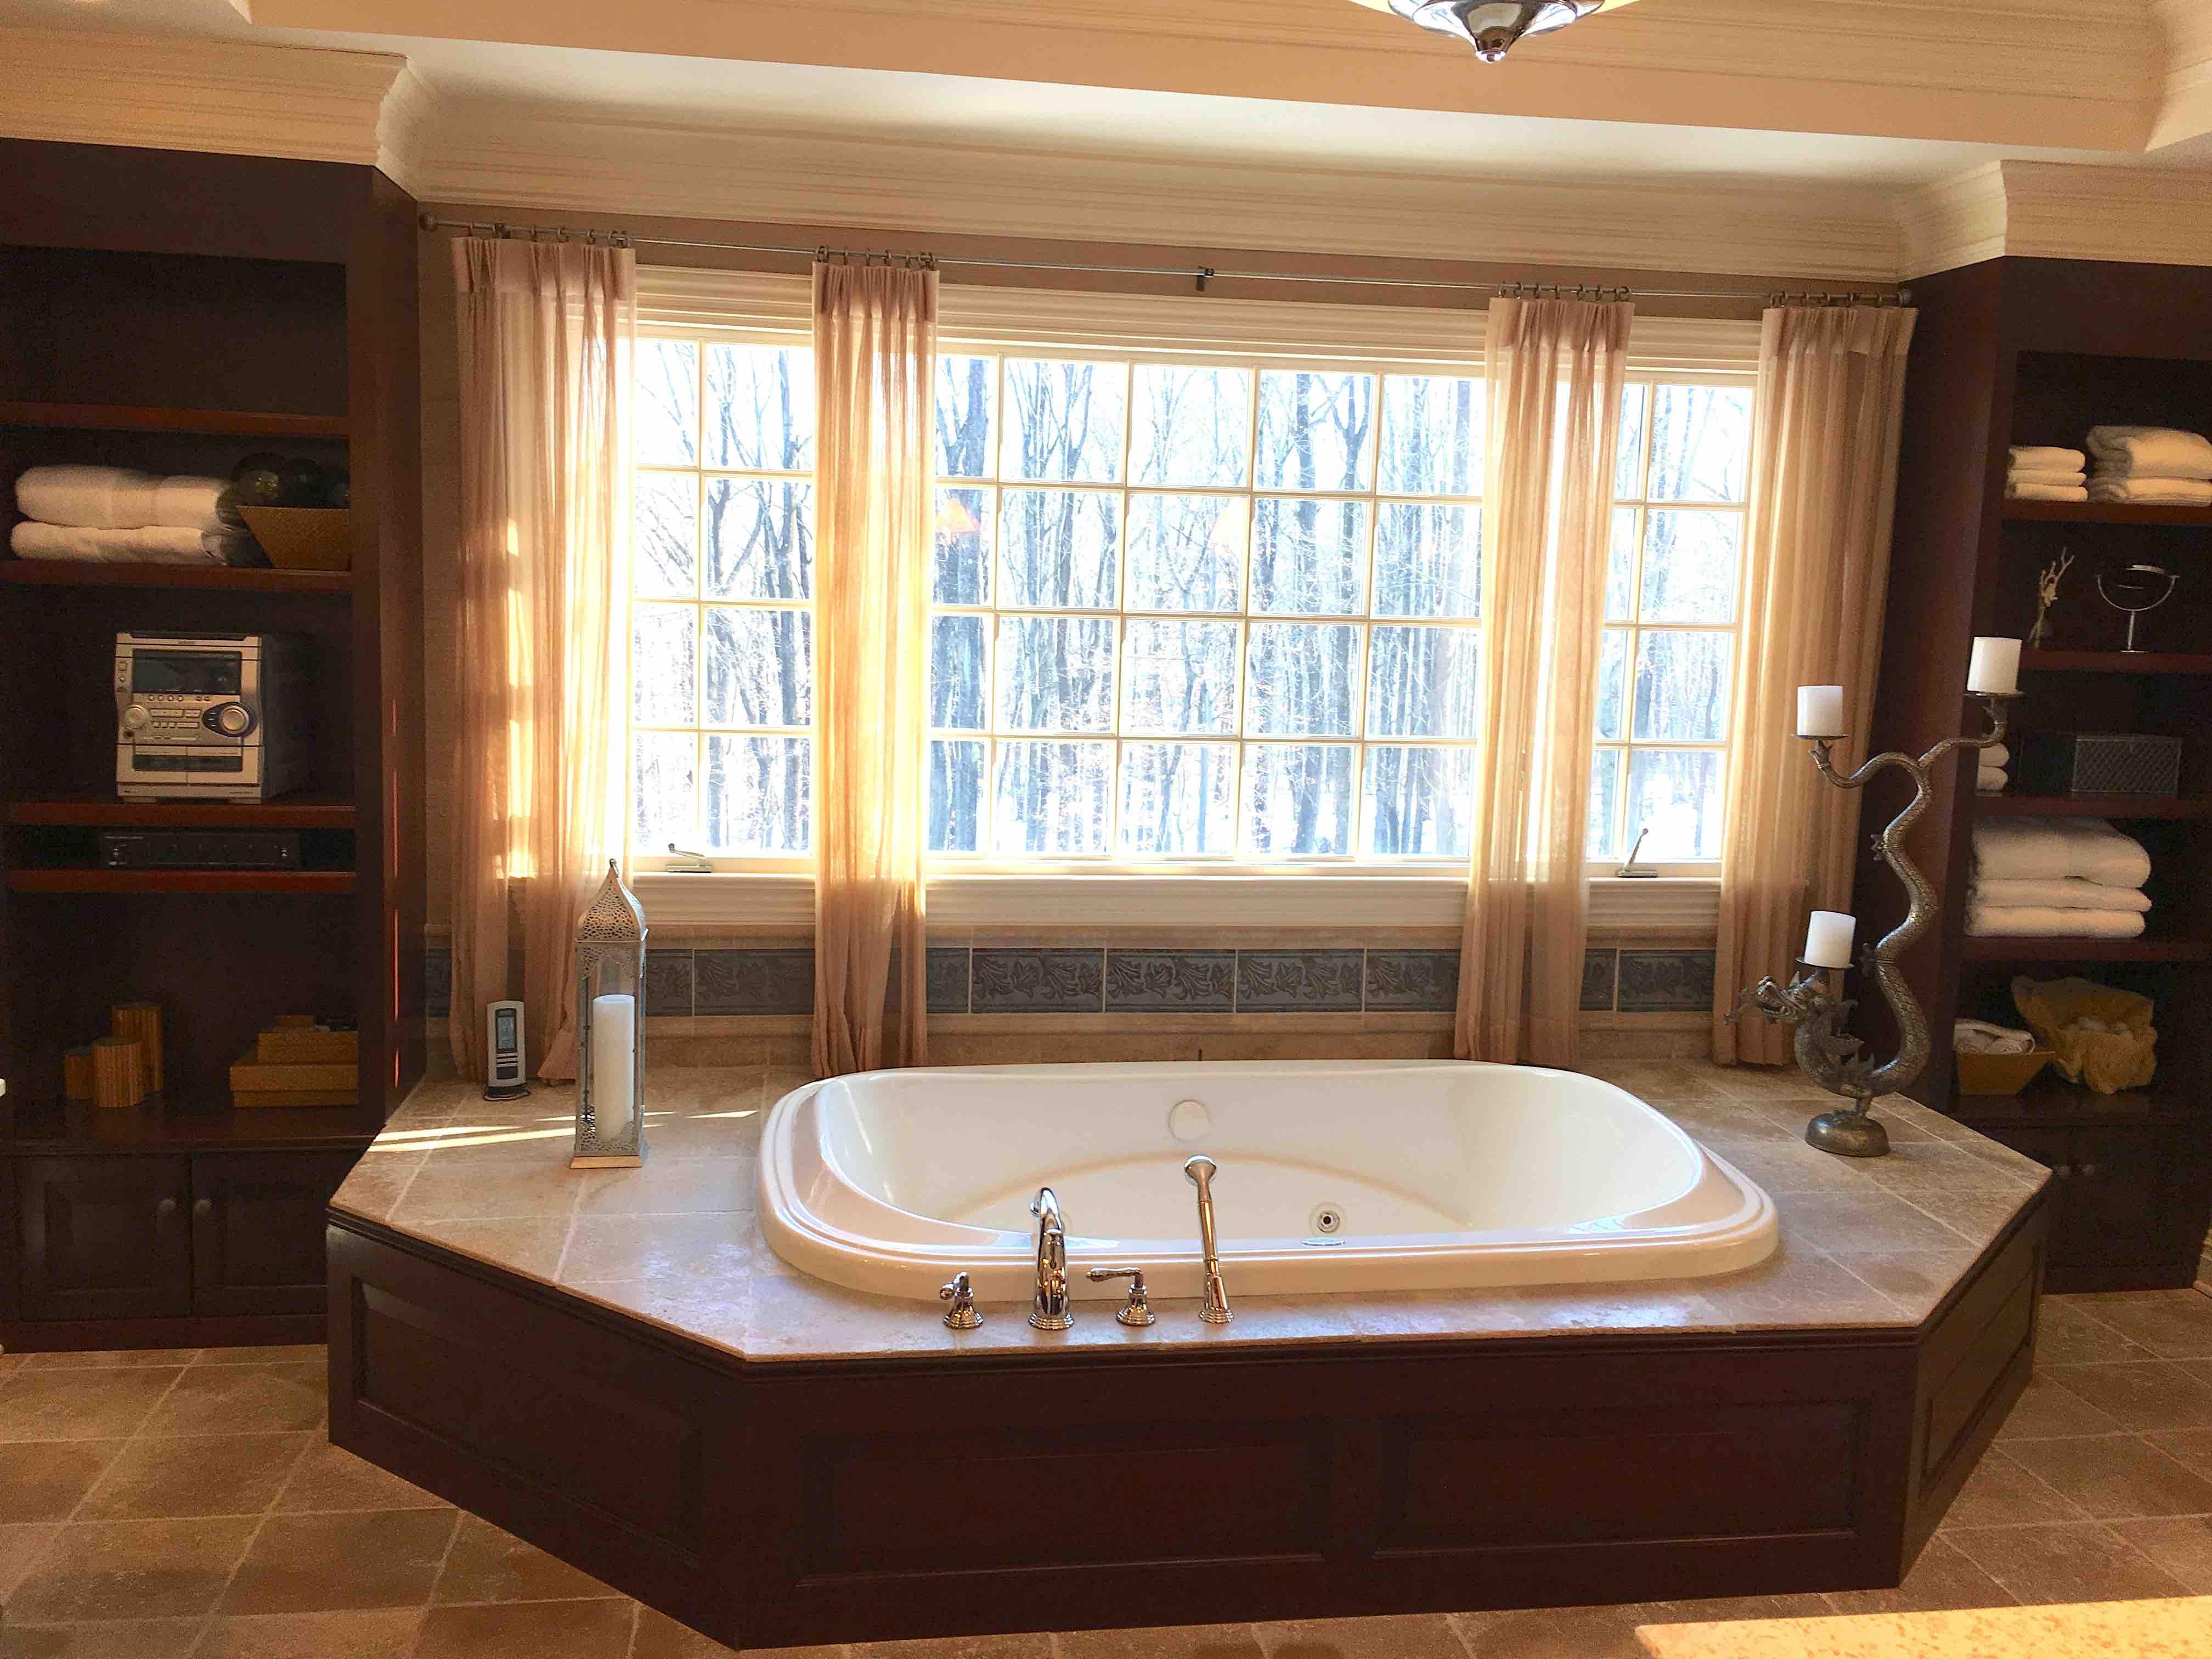 Master Bathroom Renovation Before